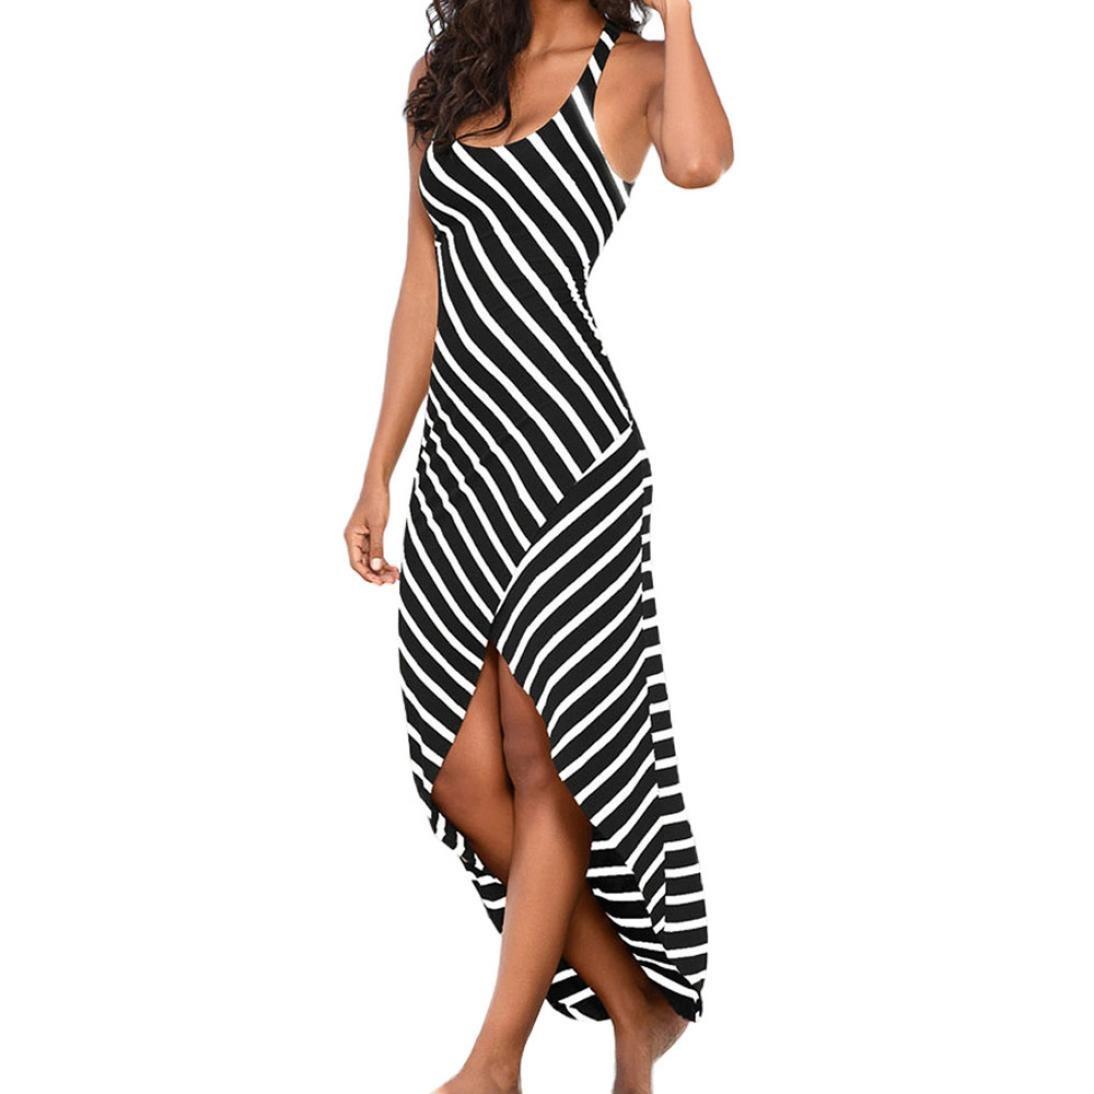 Kleid Damen Kolylong ® Frauen V-Ausschnitt elegant gestreift unregelmäßig langes Kleid Partykleid Sommer Jahrgang Strandkleid Abendkleid Sommerkleid